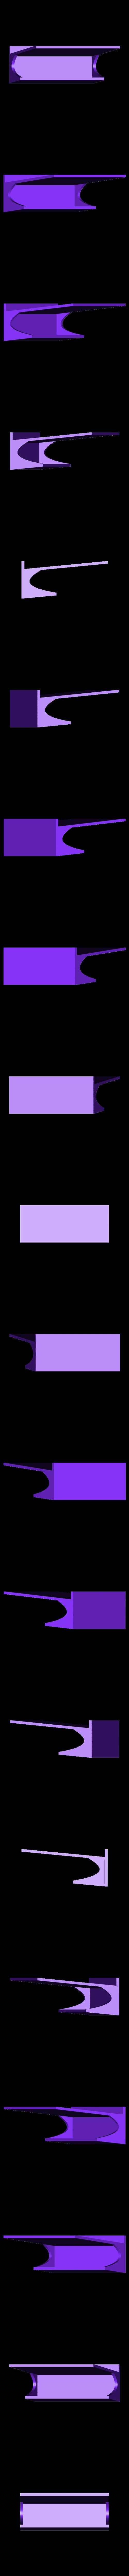 Presentoir_documentations_Arcisienne_V3.stl Download free STL file Literature display A5 • 3D printing object, Tom_le_Belk